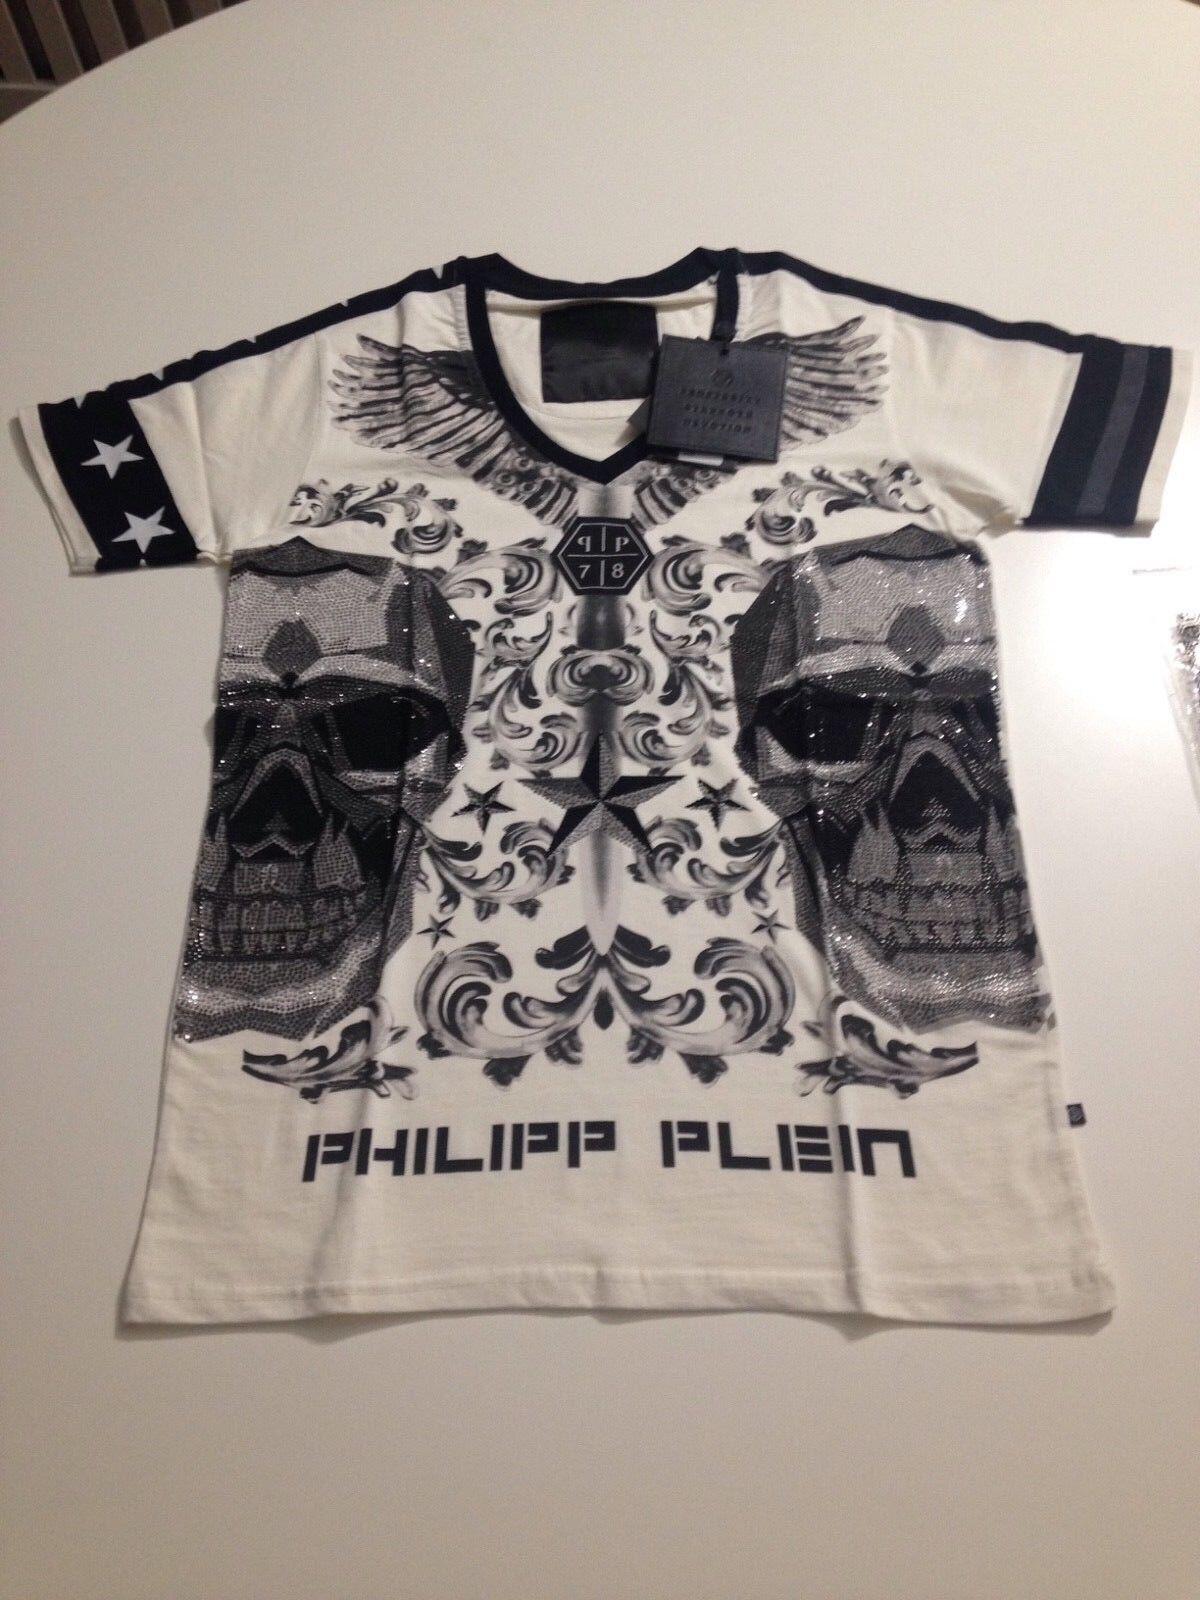 Philipp Plein t-shirt uomo taglia L. Originale